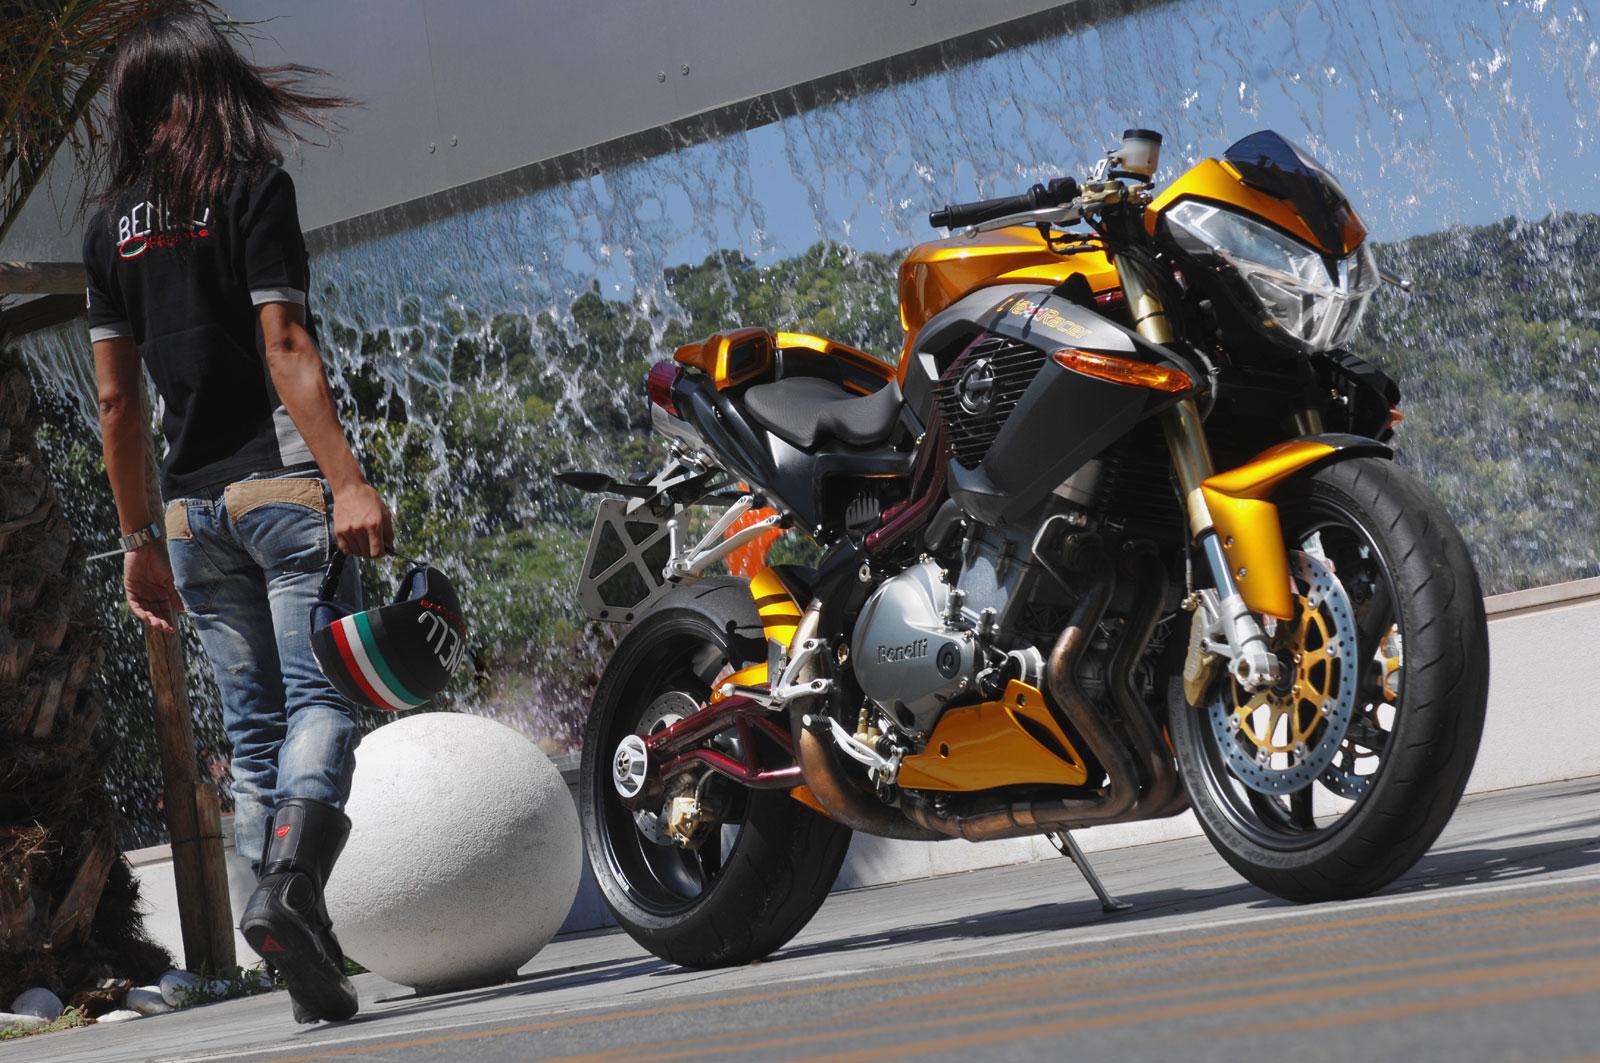 dynamite on 2 wheels - the benelli tnt cafe racer 1130 ~ return of